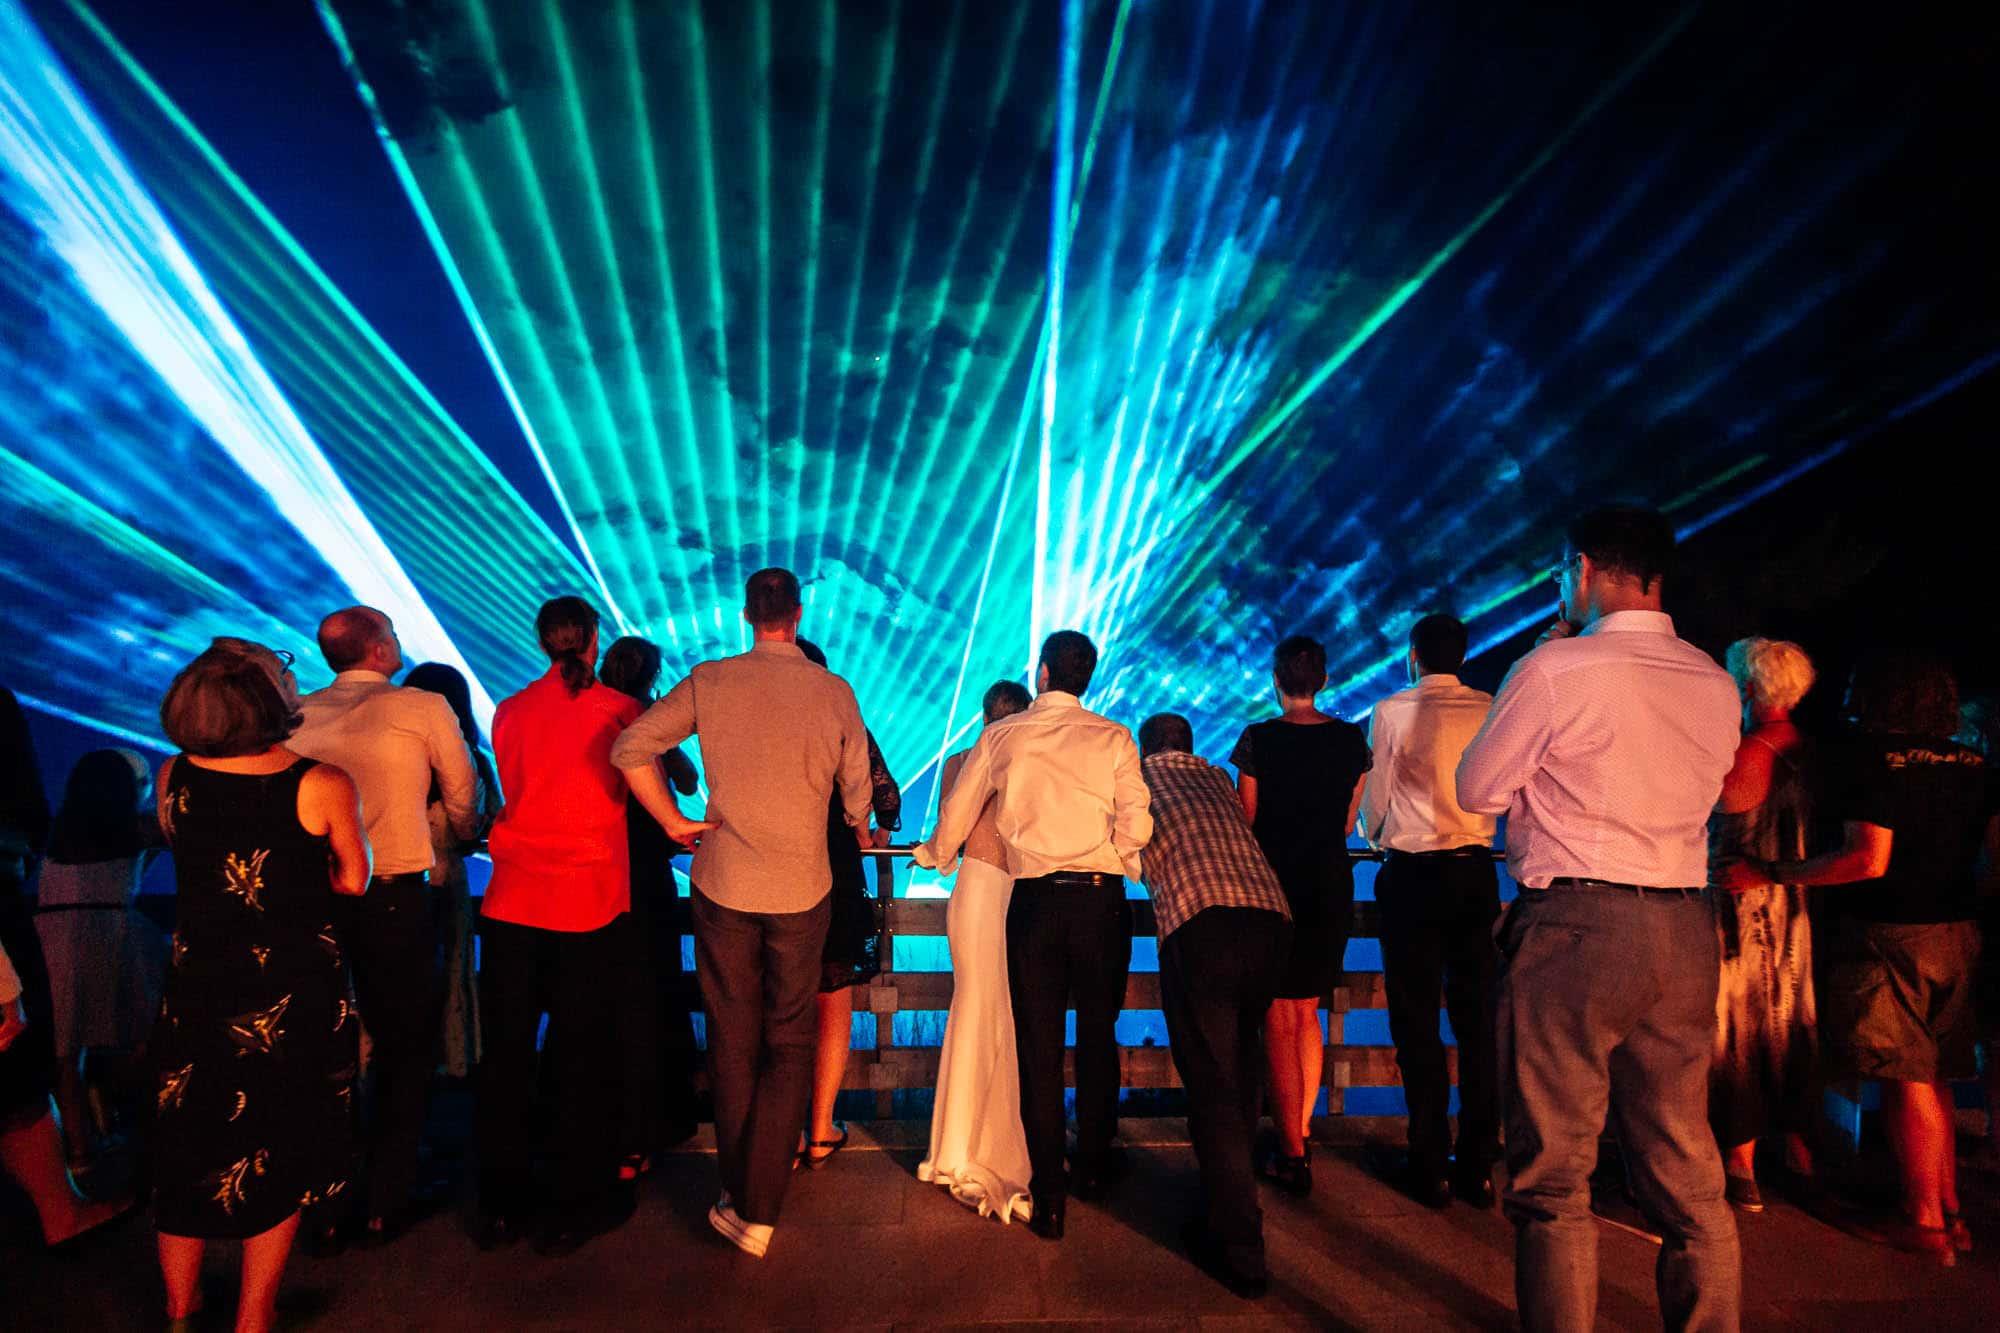 Lasershow anstatt Feuerwerk wegen Trockenheit